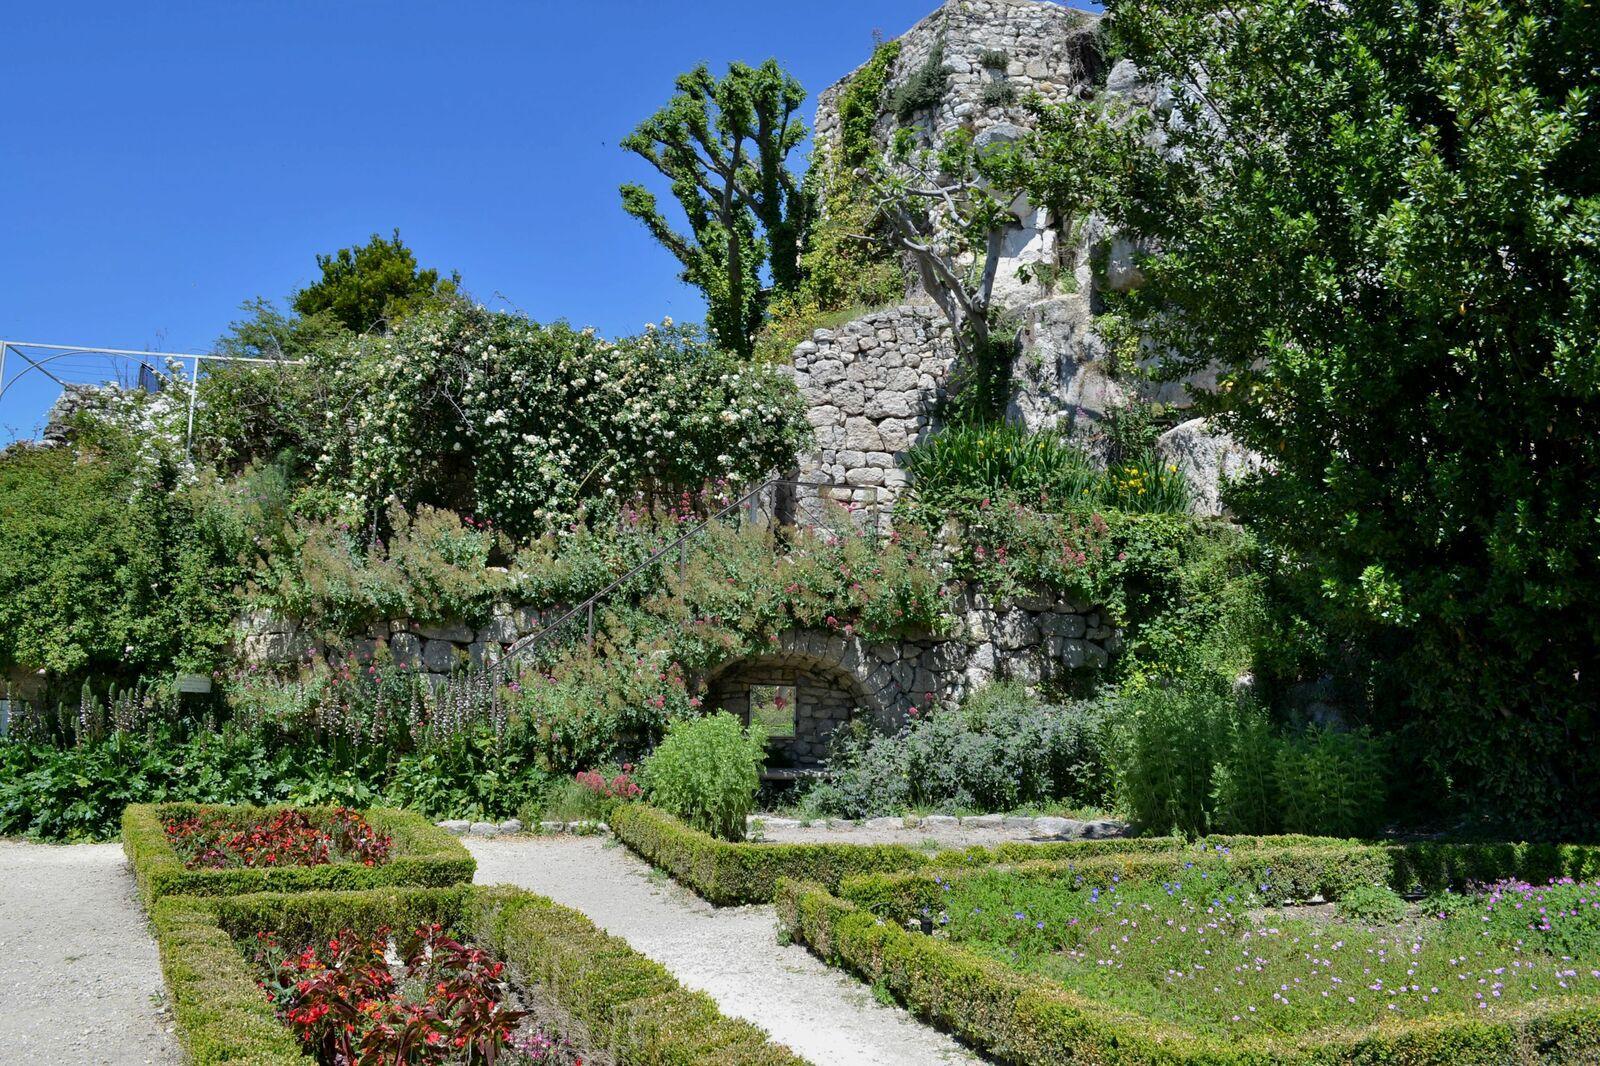 Le Jardin des Herbes...